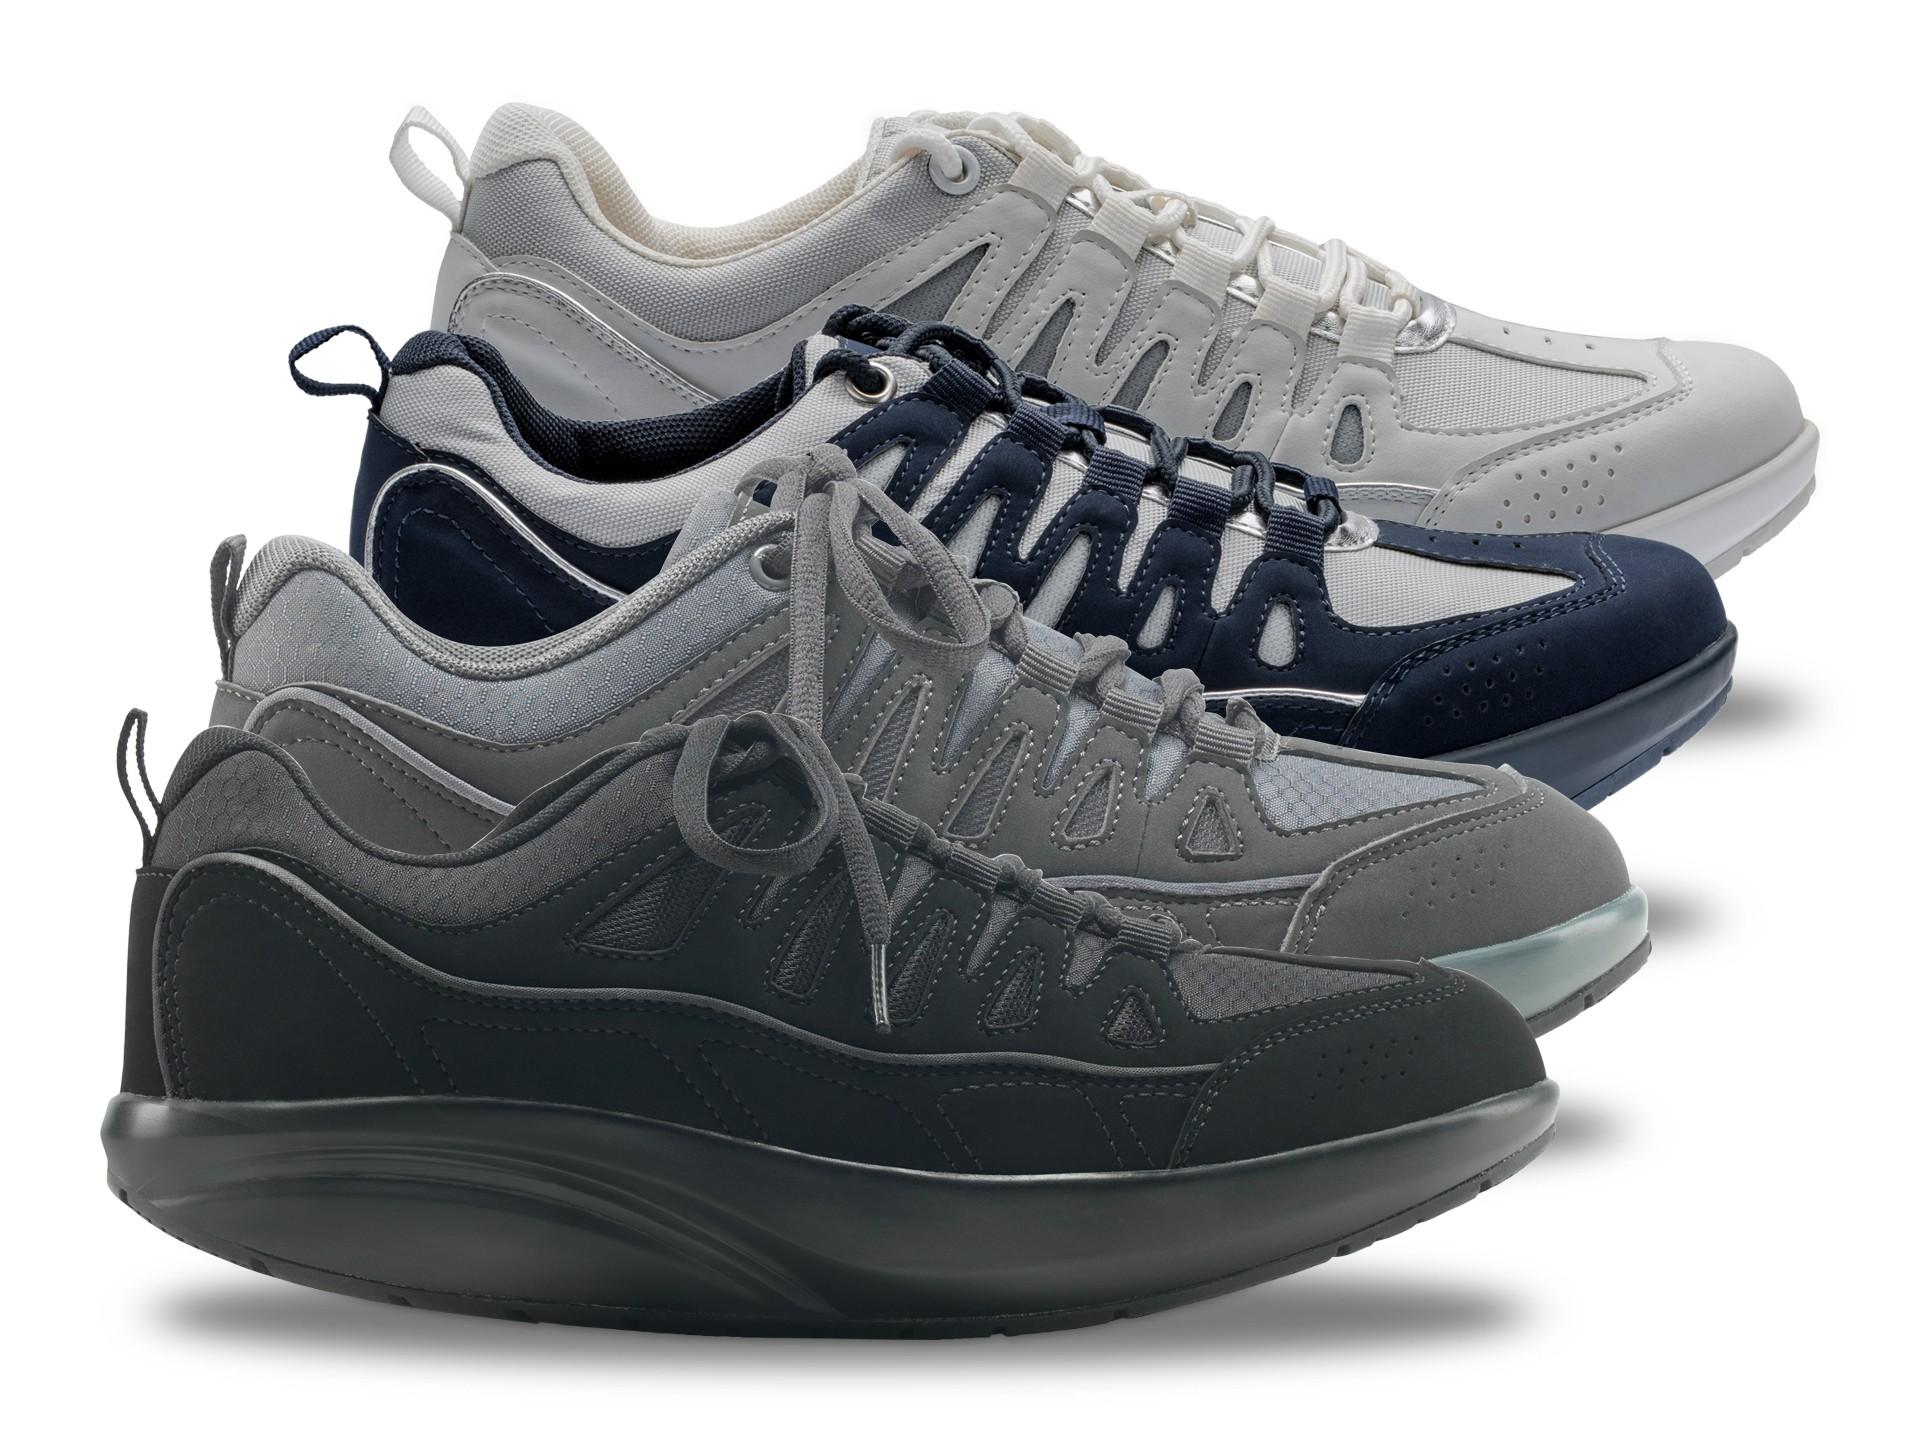 6e3b57568392c9 Кросівки Black Fit 2.0 - інтернет-магазин TopShop